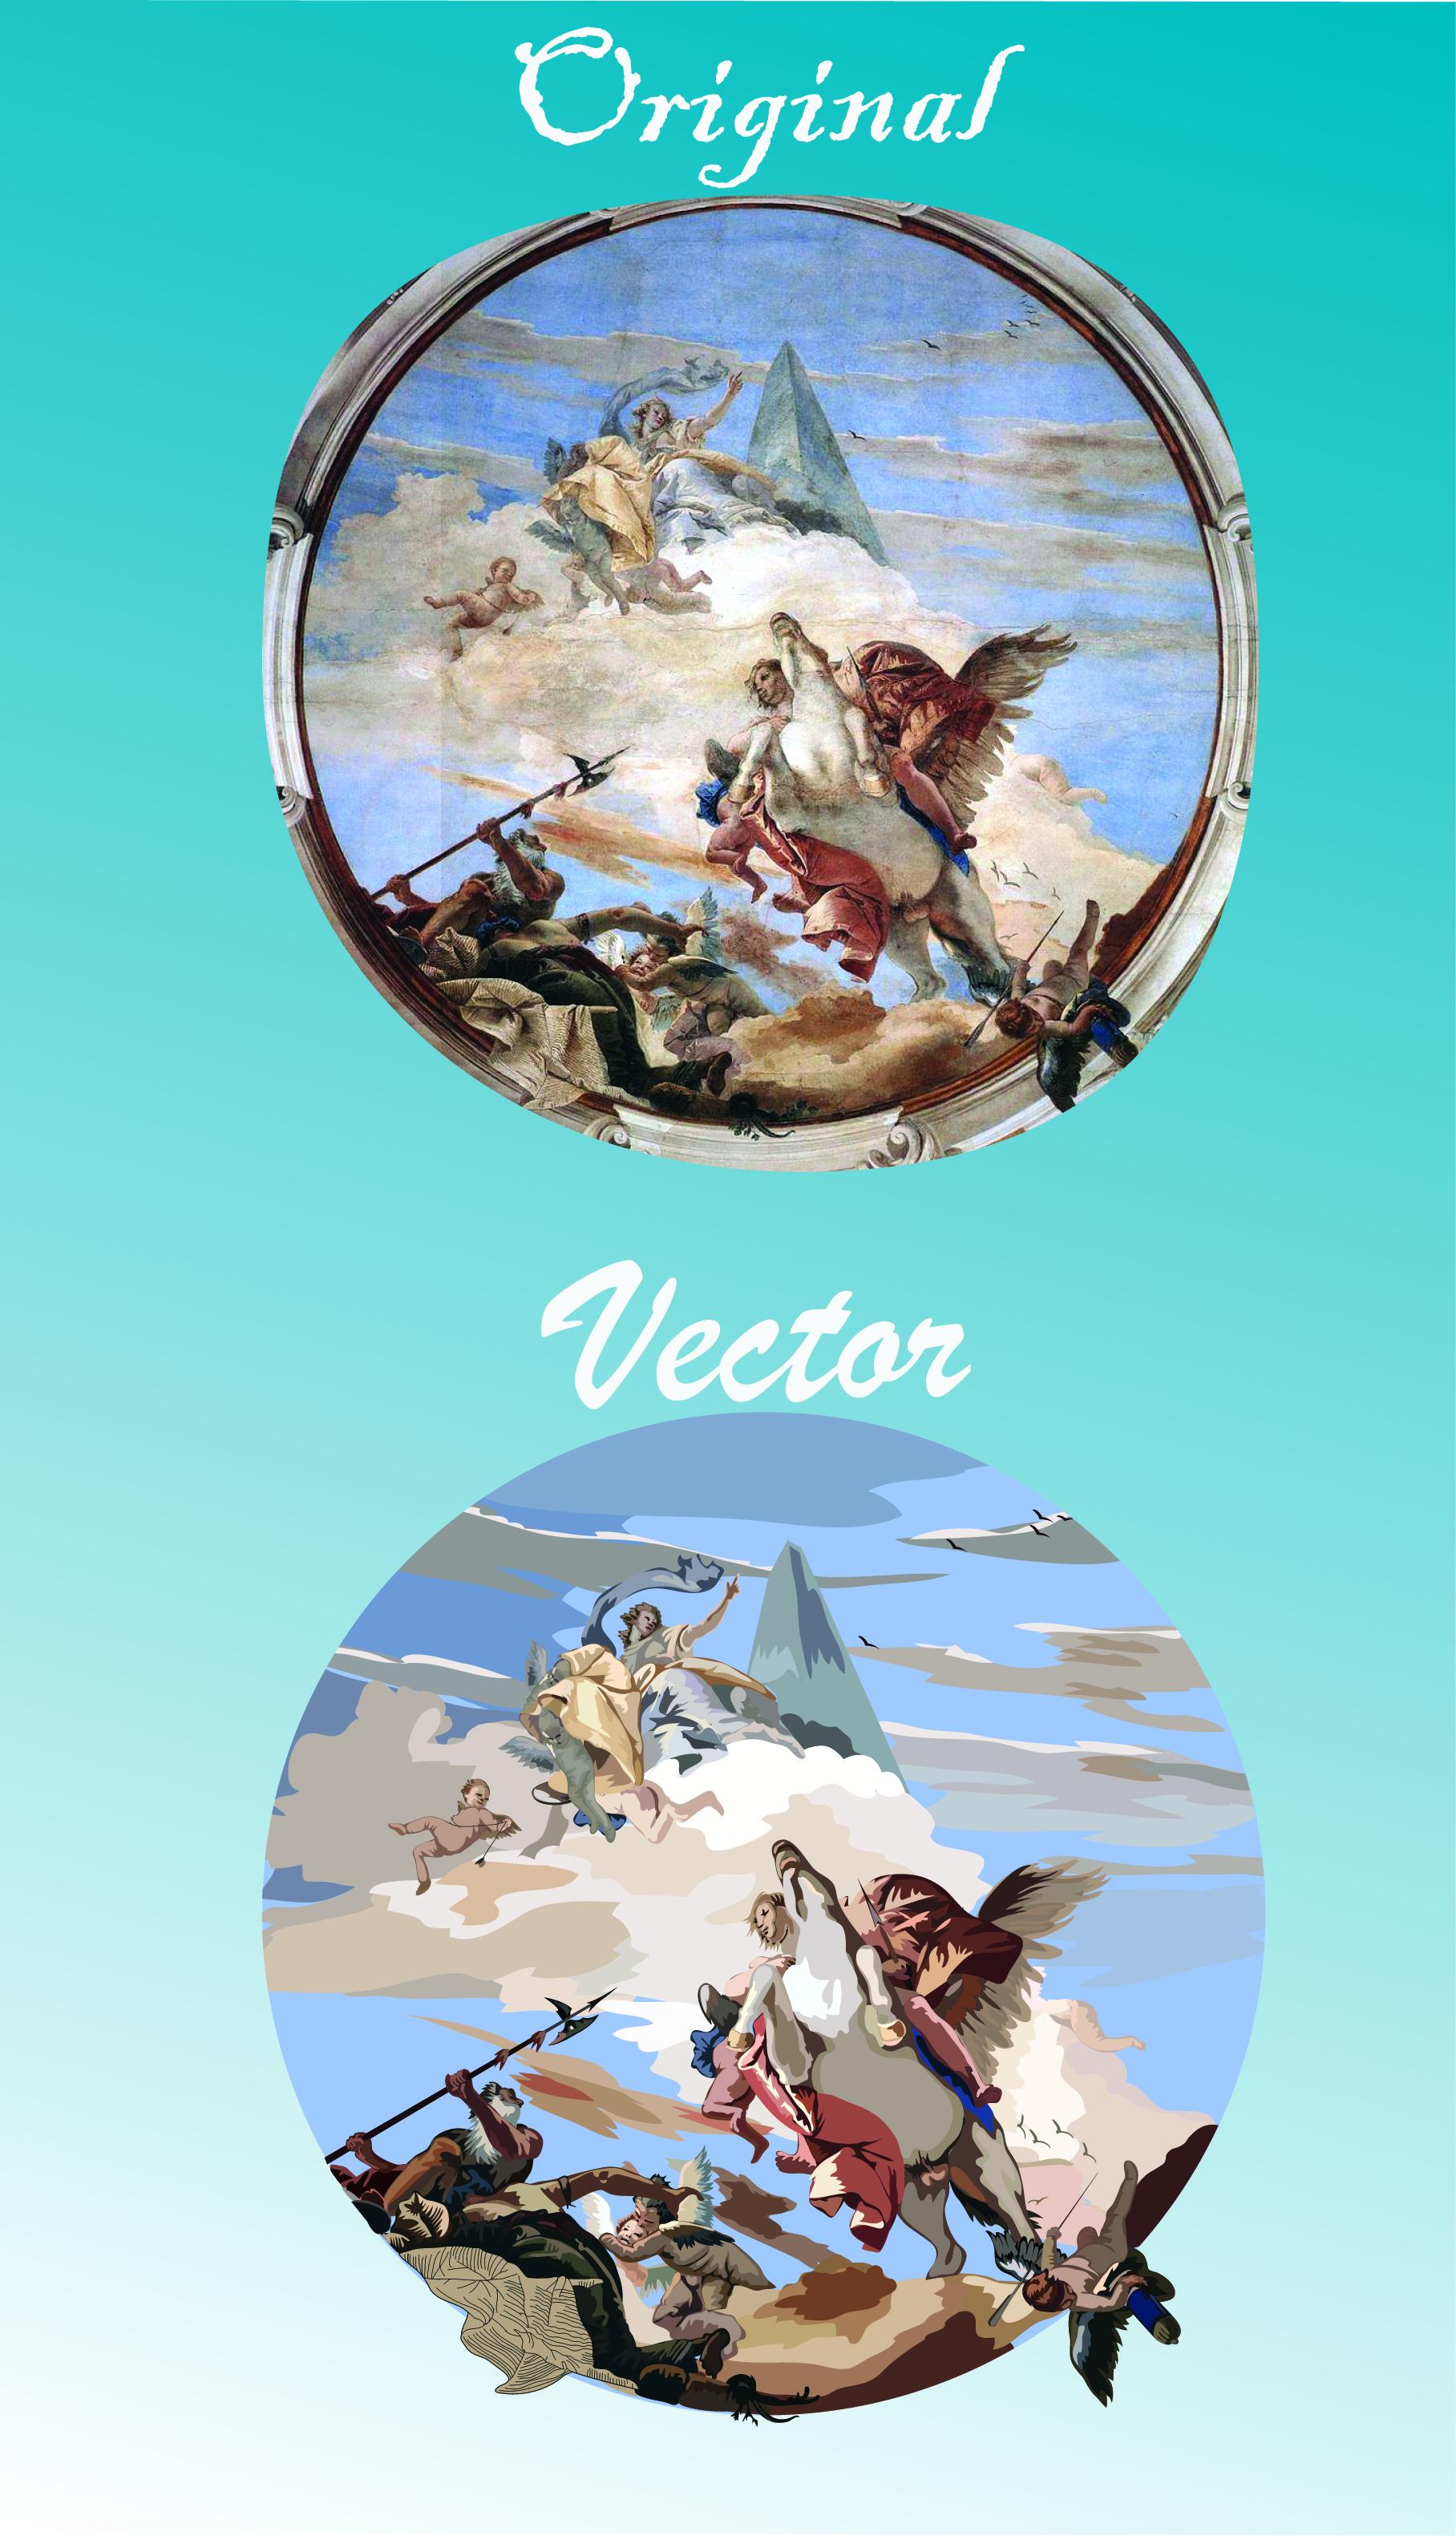 greek mythology, pegasus, BC, romans